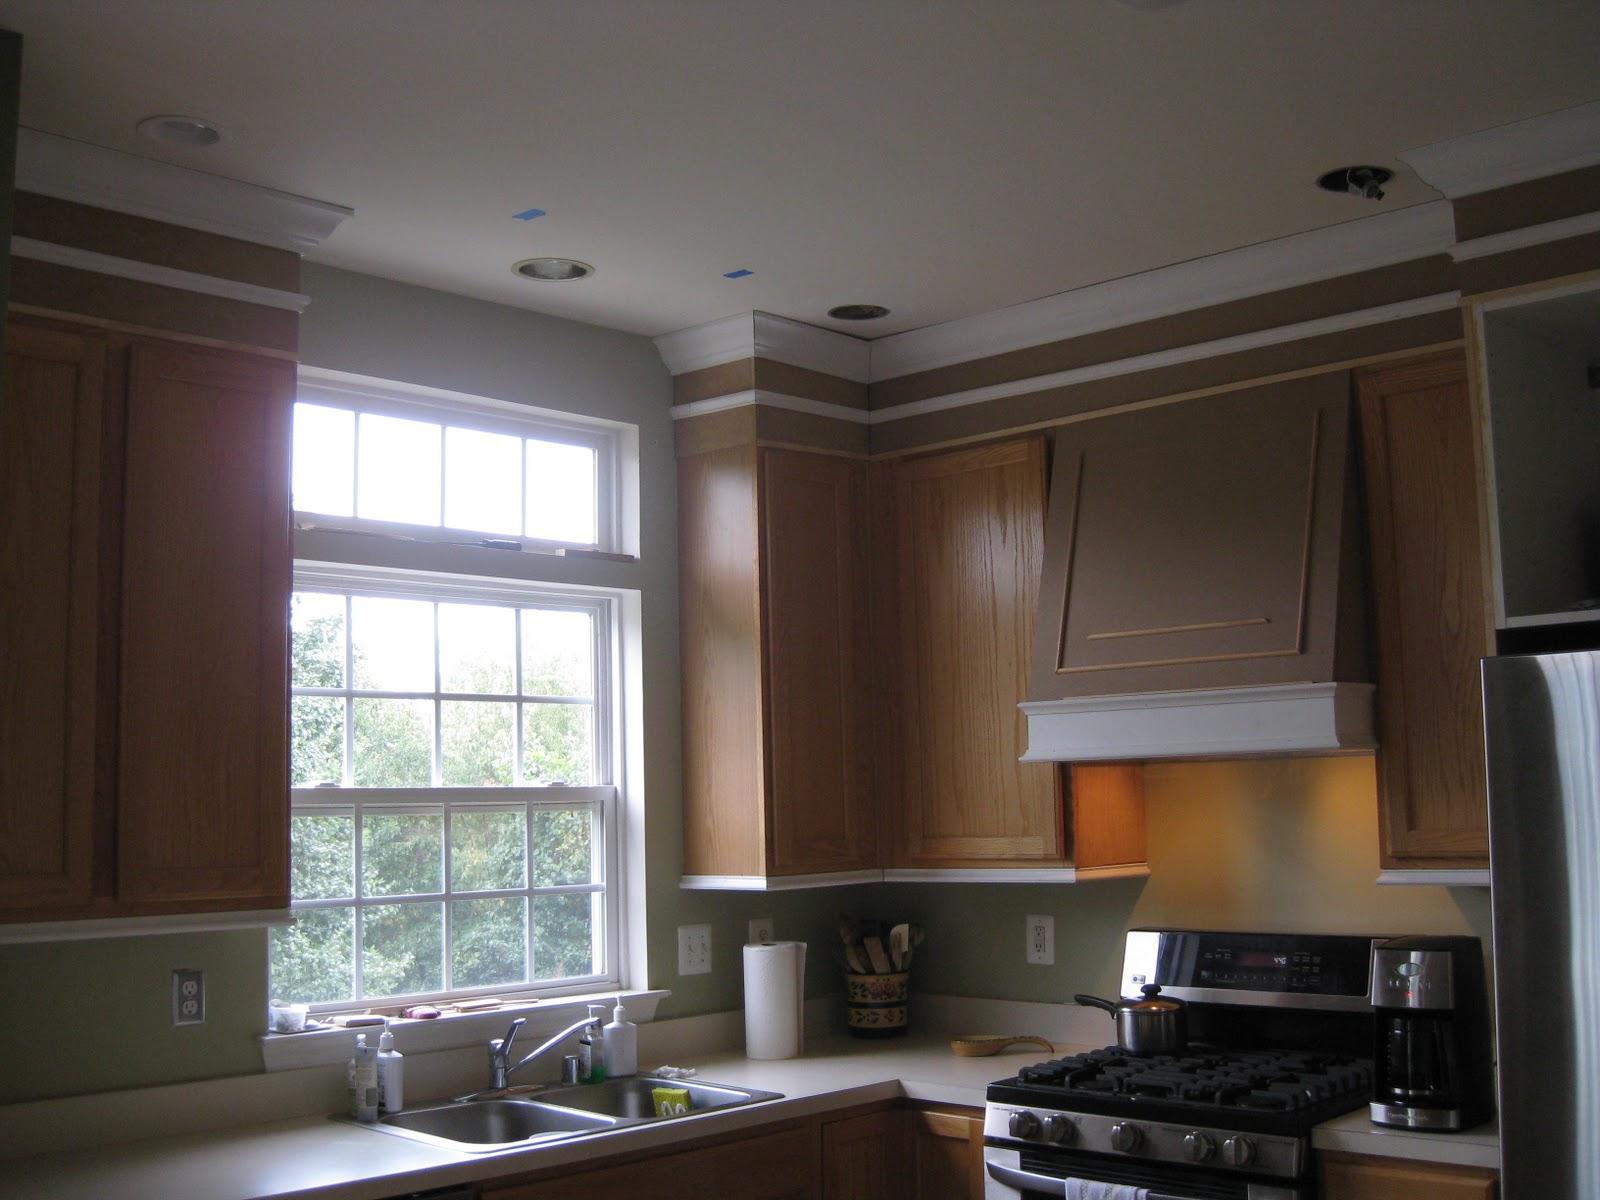 remodelando la casa adding moldings to your kitchen cabinets. Black Bedroom Furniture Sets. Home Design Ideas